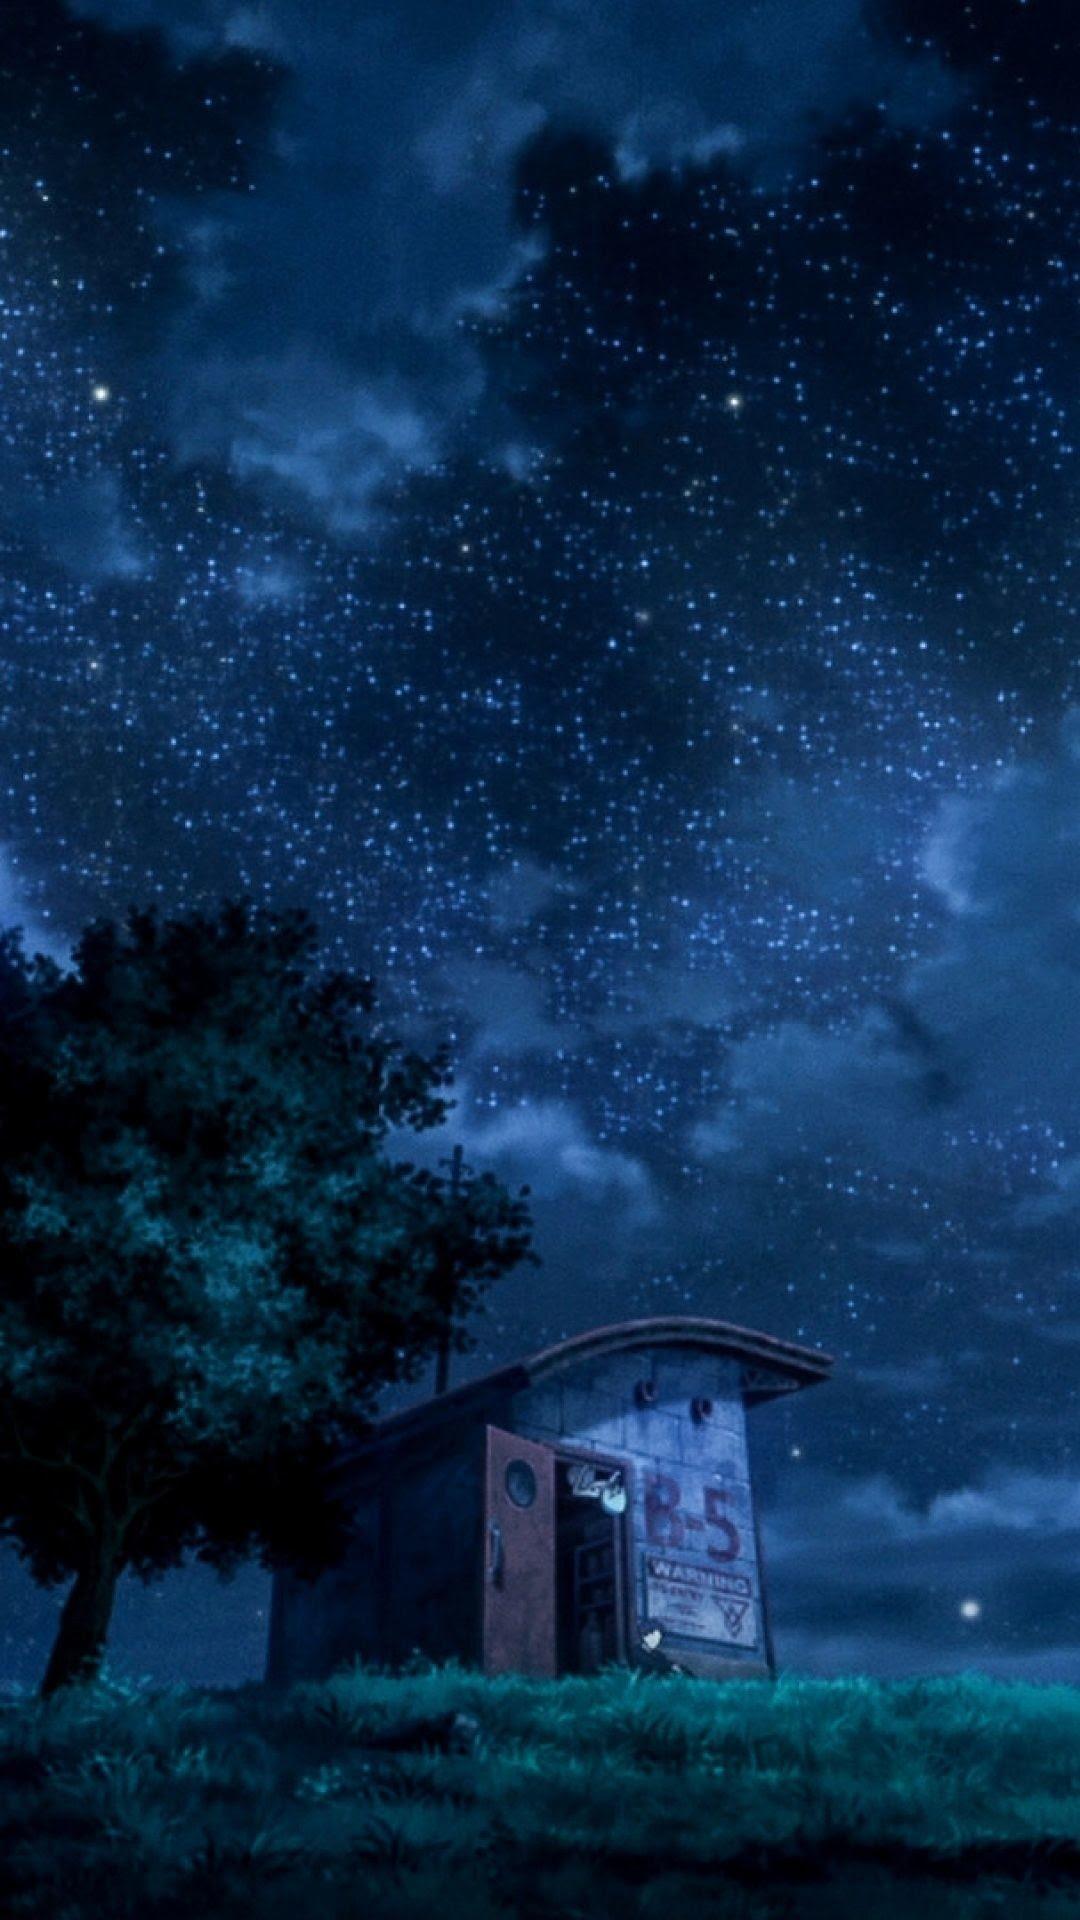 Anime Wallpaper 1366x768 : anime, wallpaper, 1366x768, Aesthetic, Anime, Wallpaper, Sachi